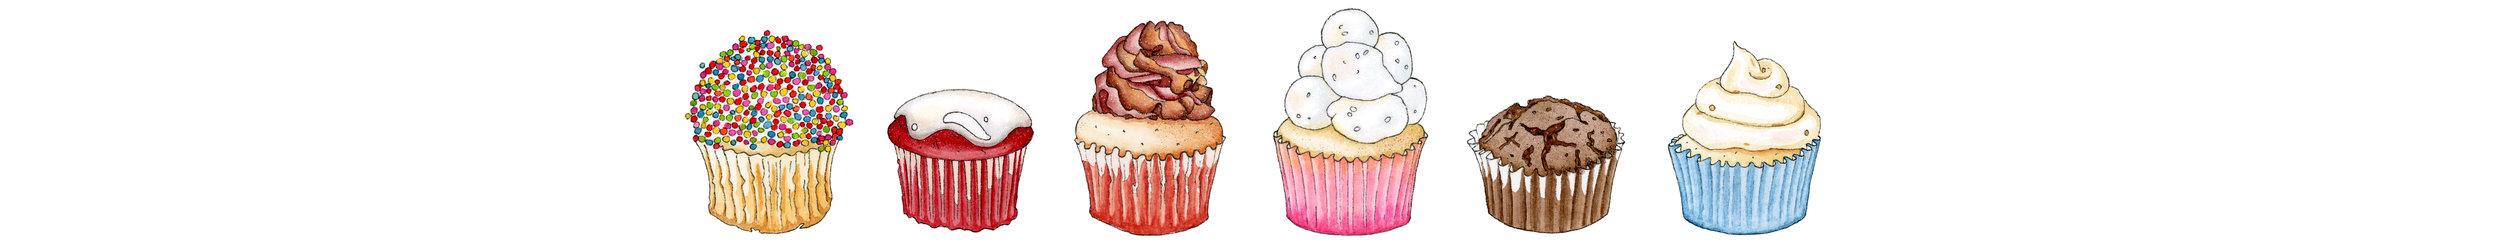 CupcakeBanner.jpg